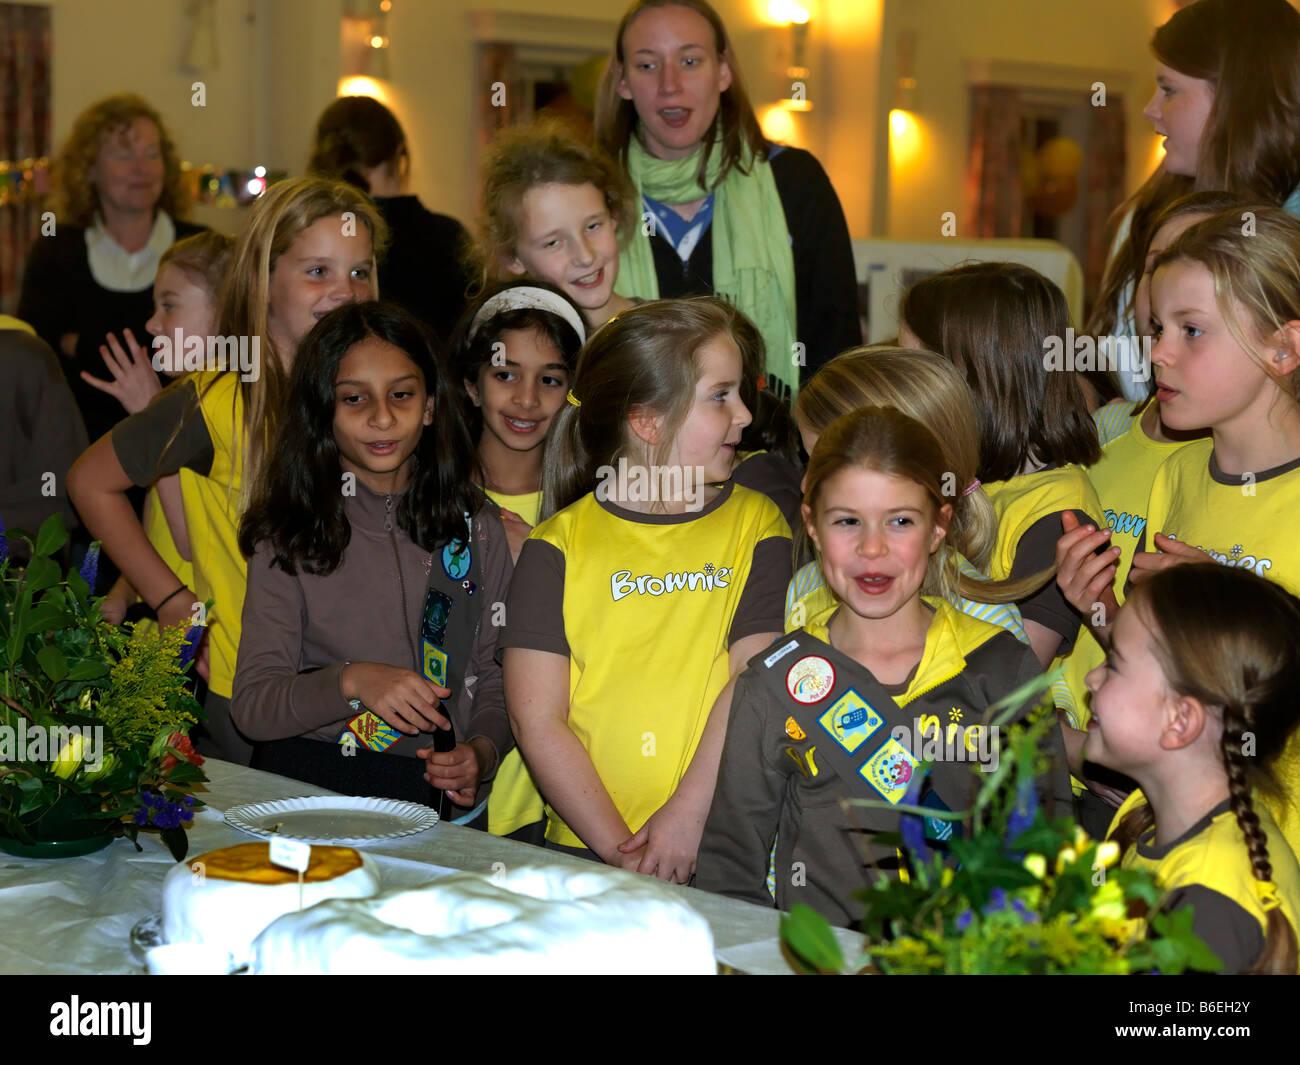 80th Brownie Celebration - Stock Image